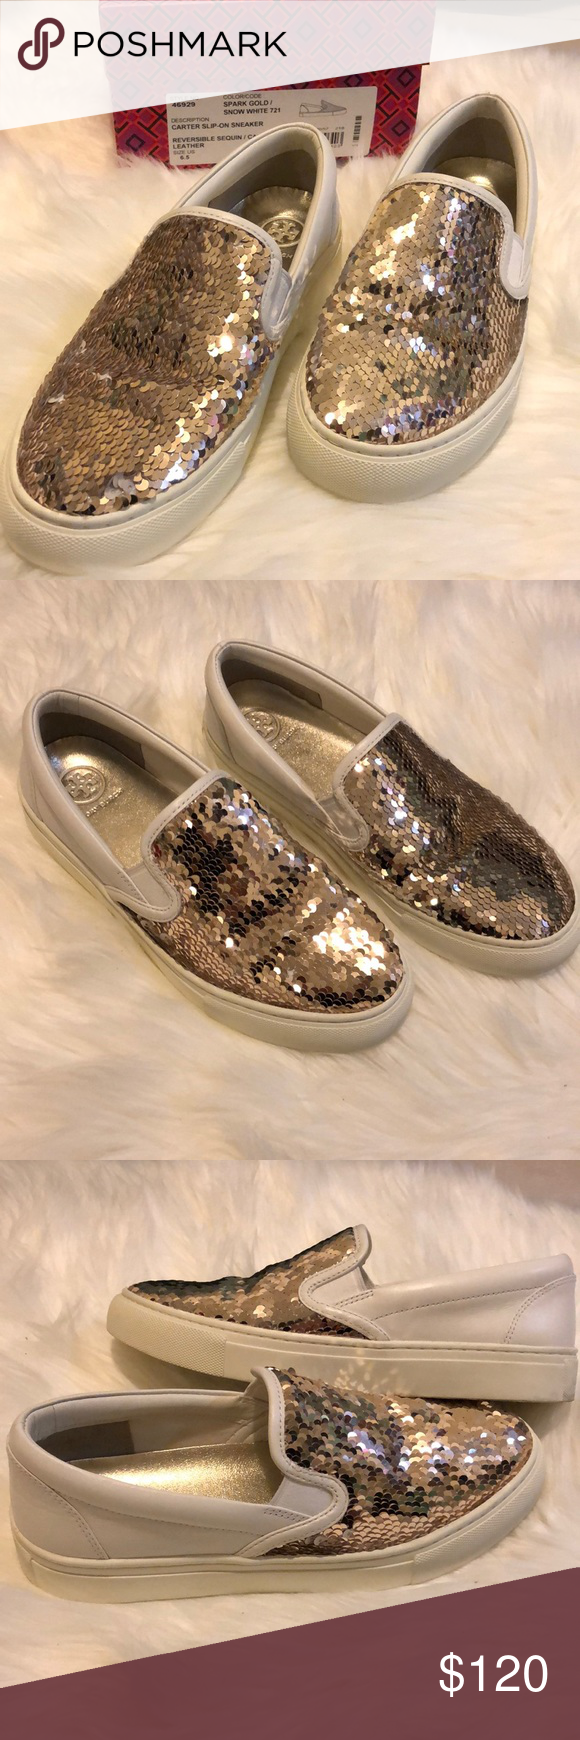 c7ae958a7da NIB Tory Burch sequin Carter Slip on sneakers Brand new in Box - Tory  Burch reversible sequin calf leather slip on sneaker in Gold Snow white.